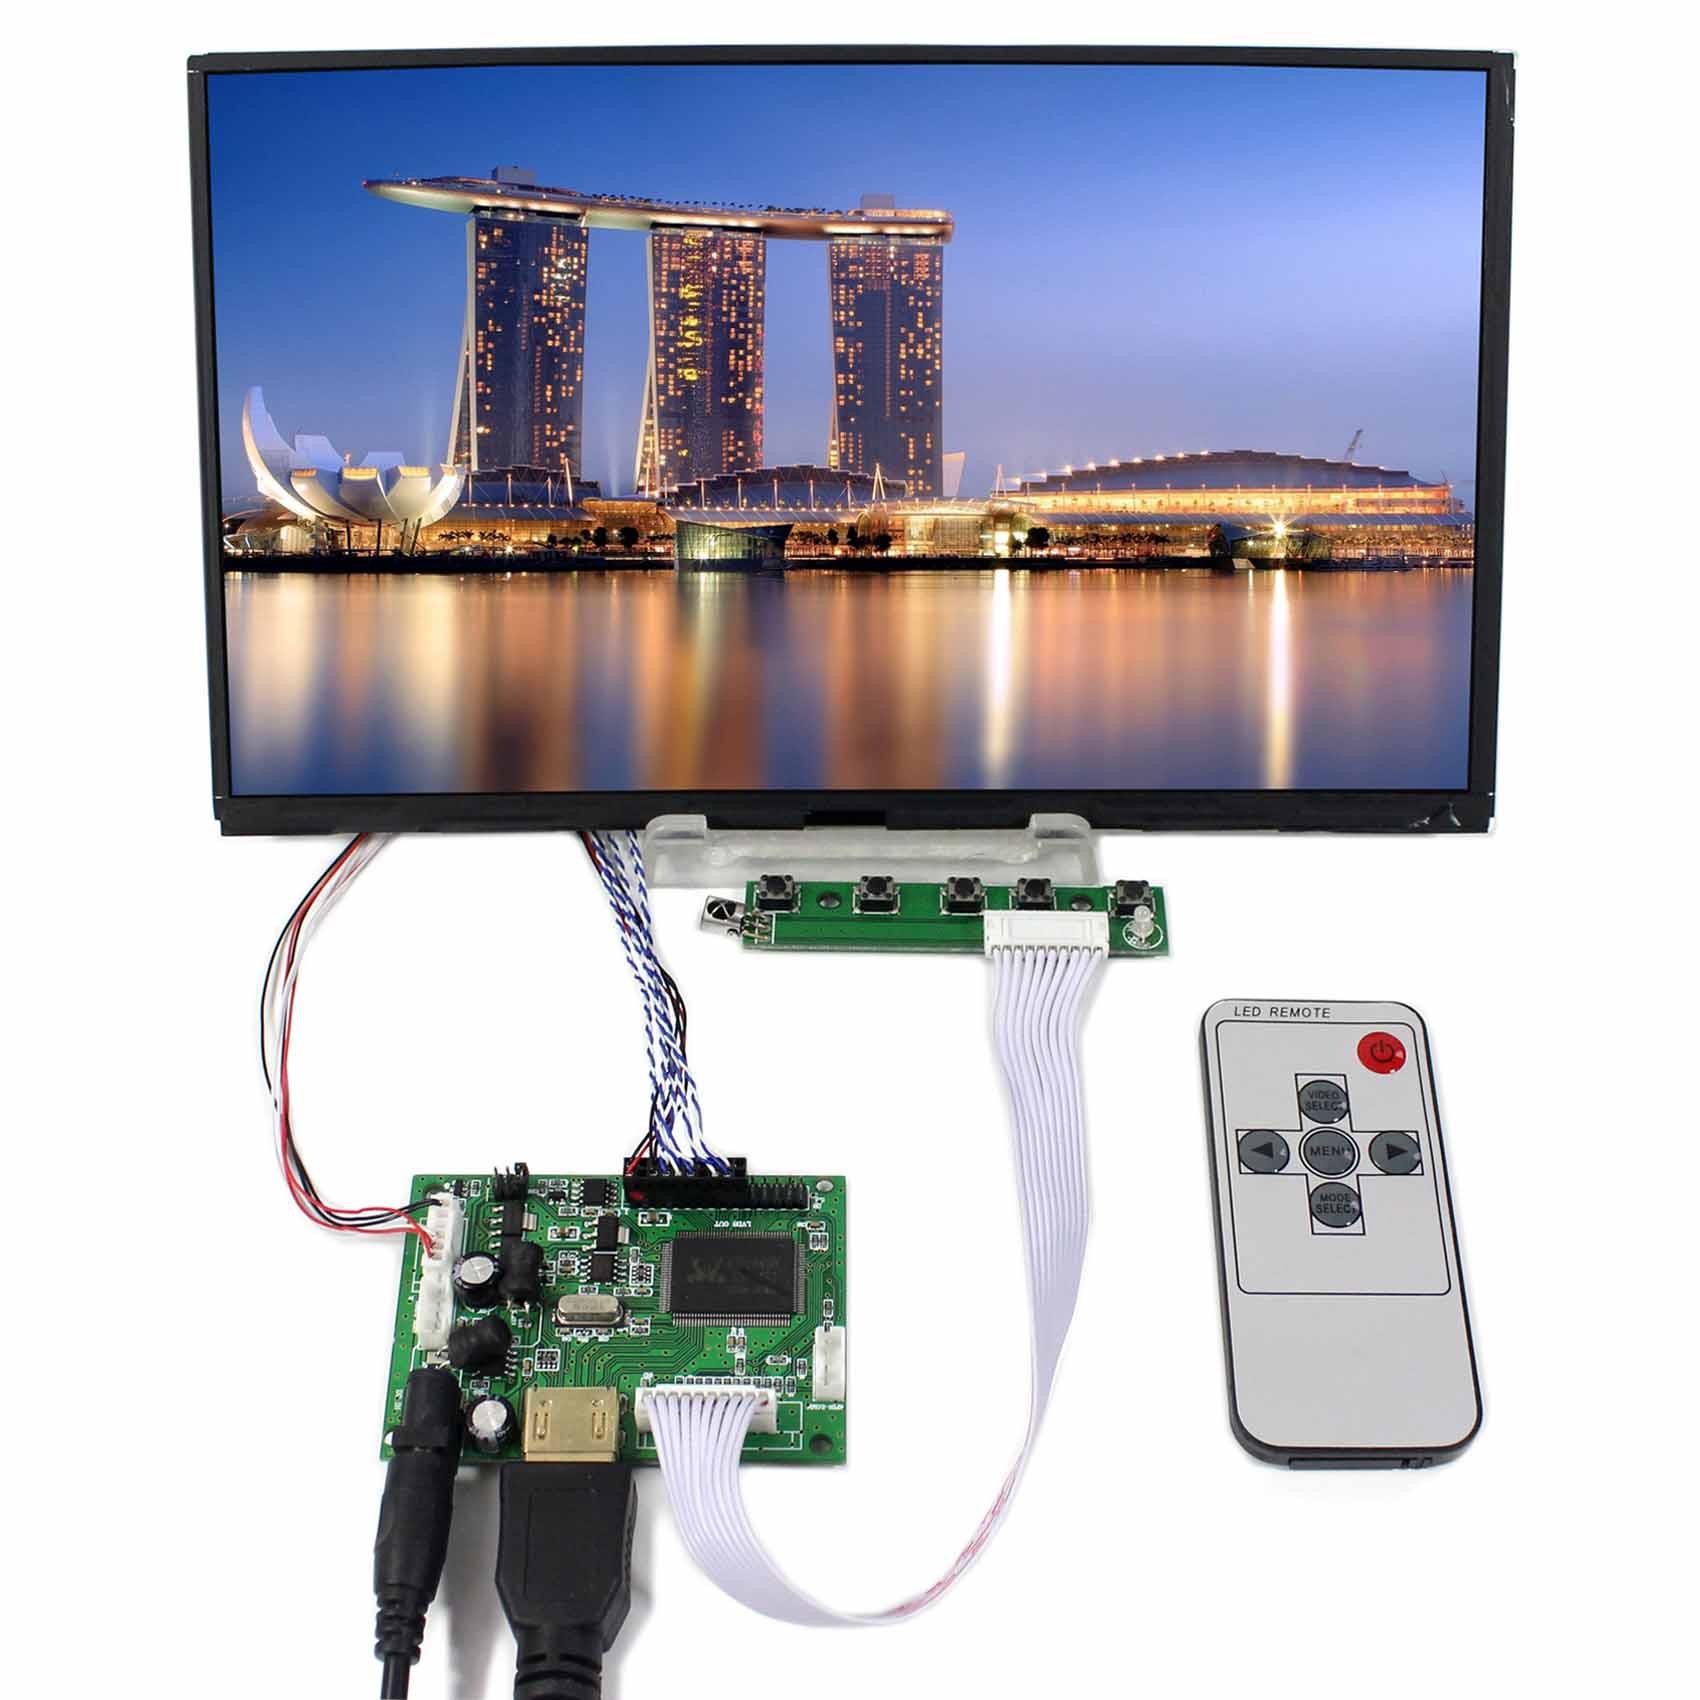 HDMI LCD Controller Board VS-TY2660H-V1+10.1inch 1366x768 B101XAN01 N101BCG IPS LCD Screen vga hdmi lcd controller board for lp156whu tpb1 lp156whu tpa1 lp156whu tpbh lp156whu tpd1 15 6 inch edp 30 pins 1 lane 1366x768